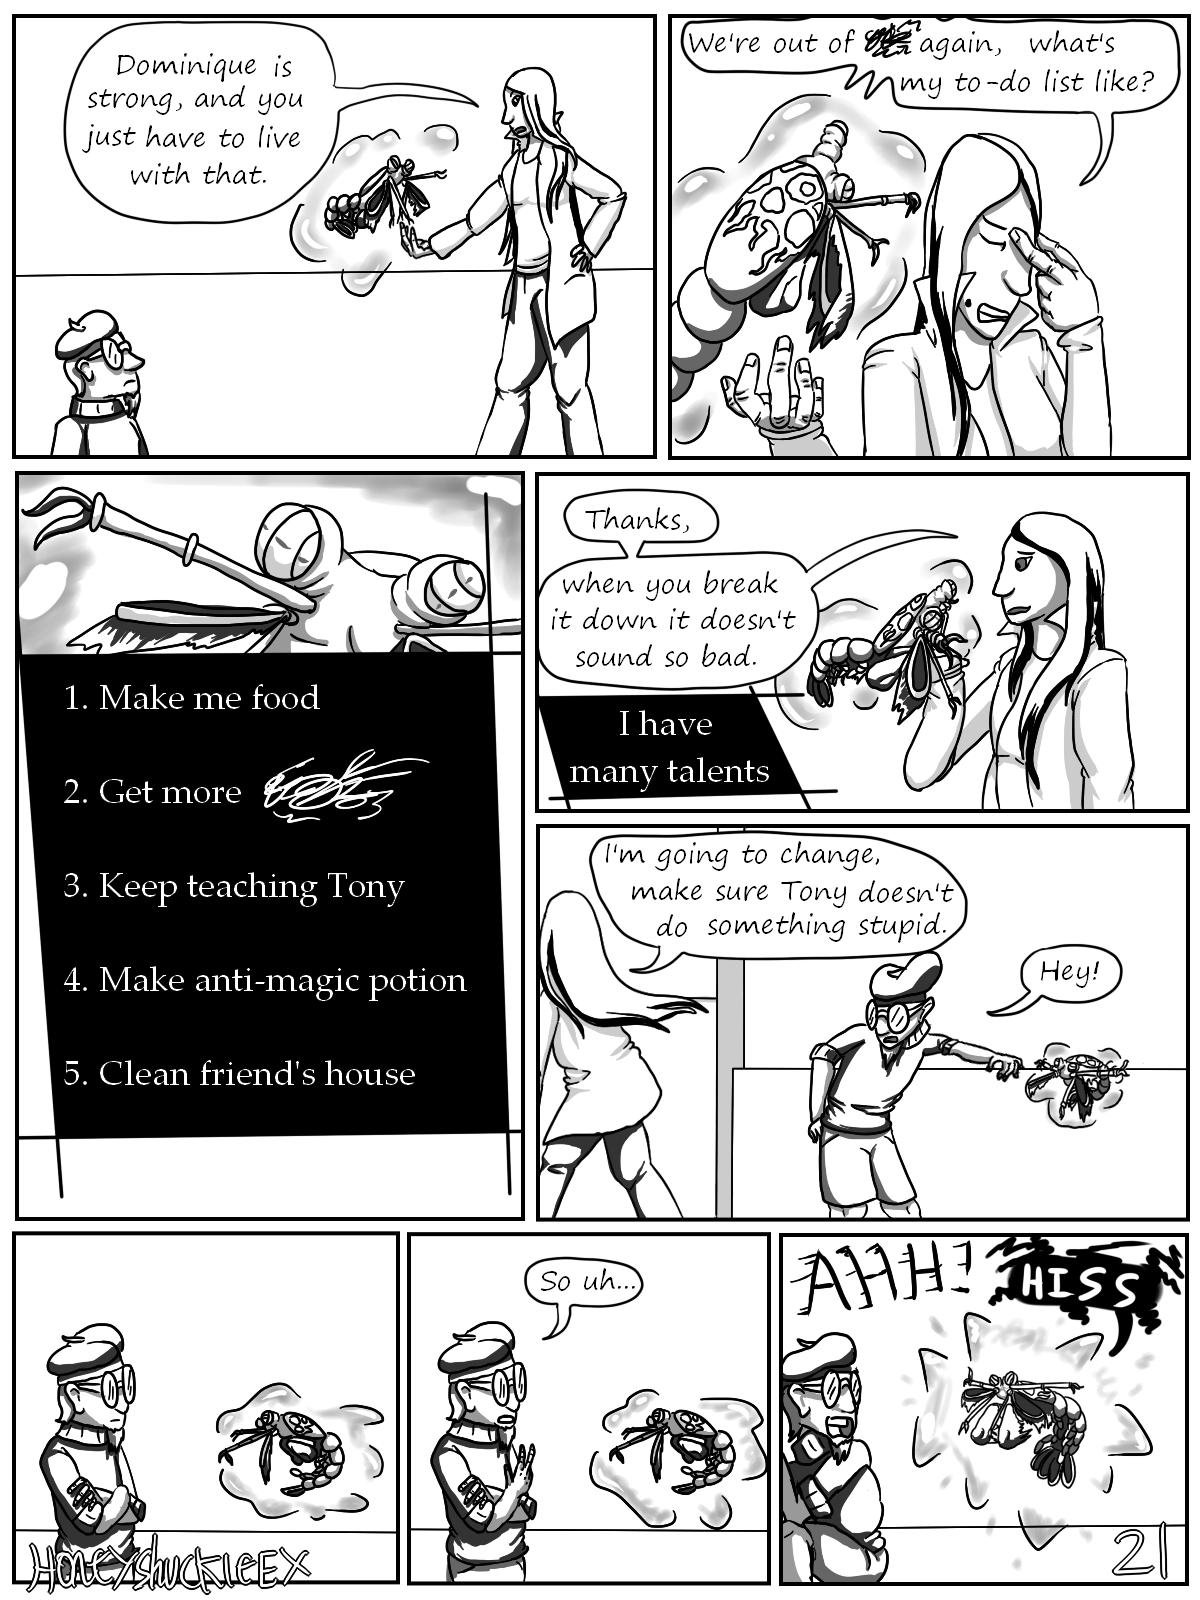 Apprentice page 21